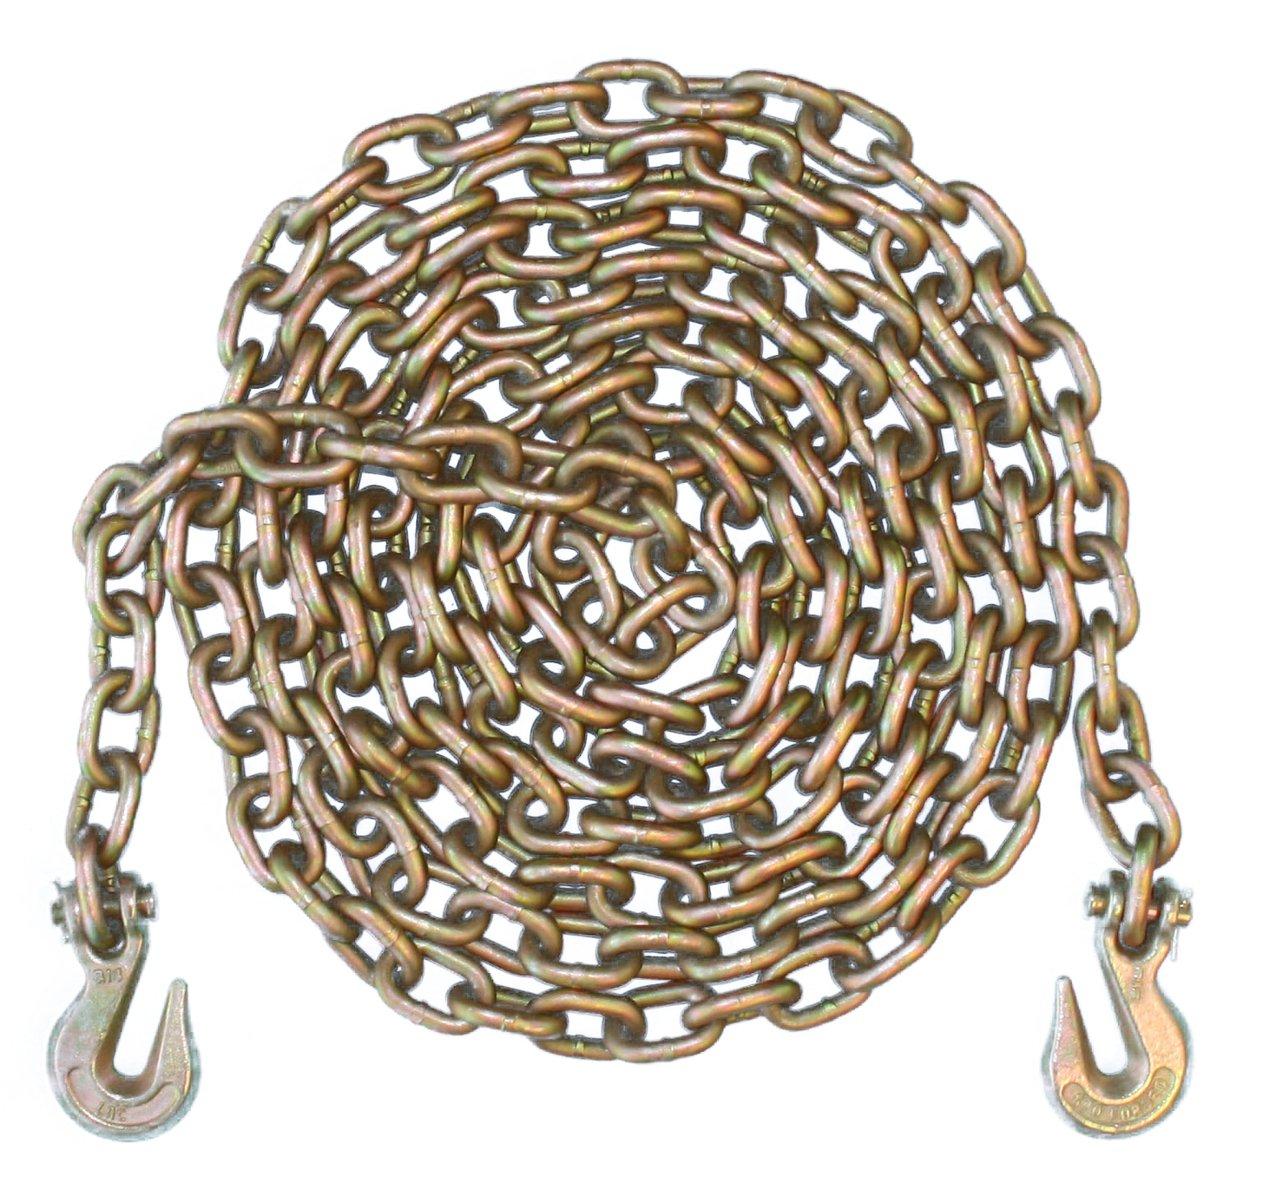 3/8'' - Grade 70 Binder Chain - Grab Hooks - 20' Length